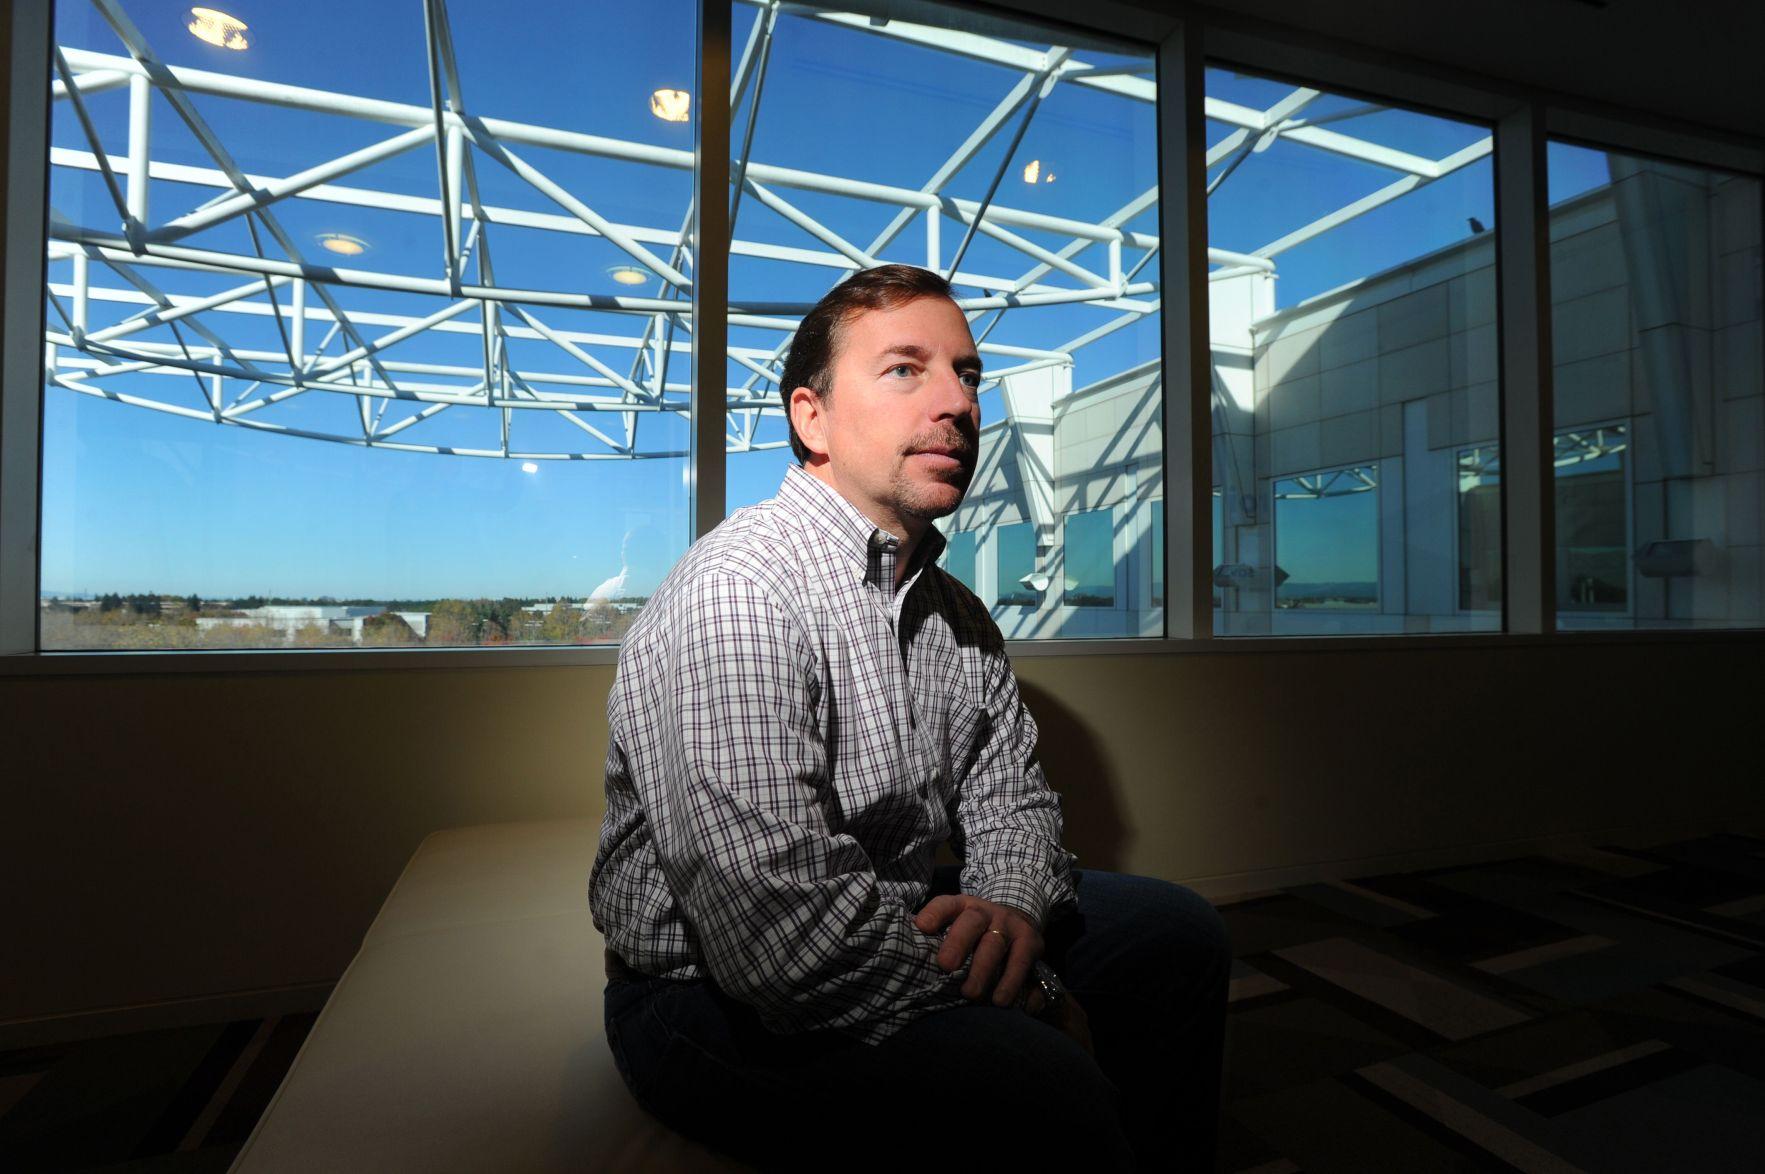 Yahoo Ceo Scott Thompson Resigns After Resume Flap Levinsohn